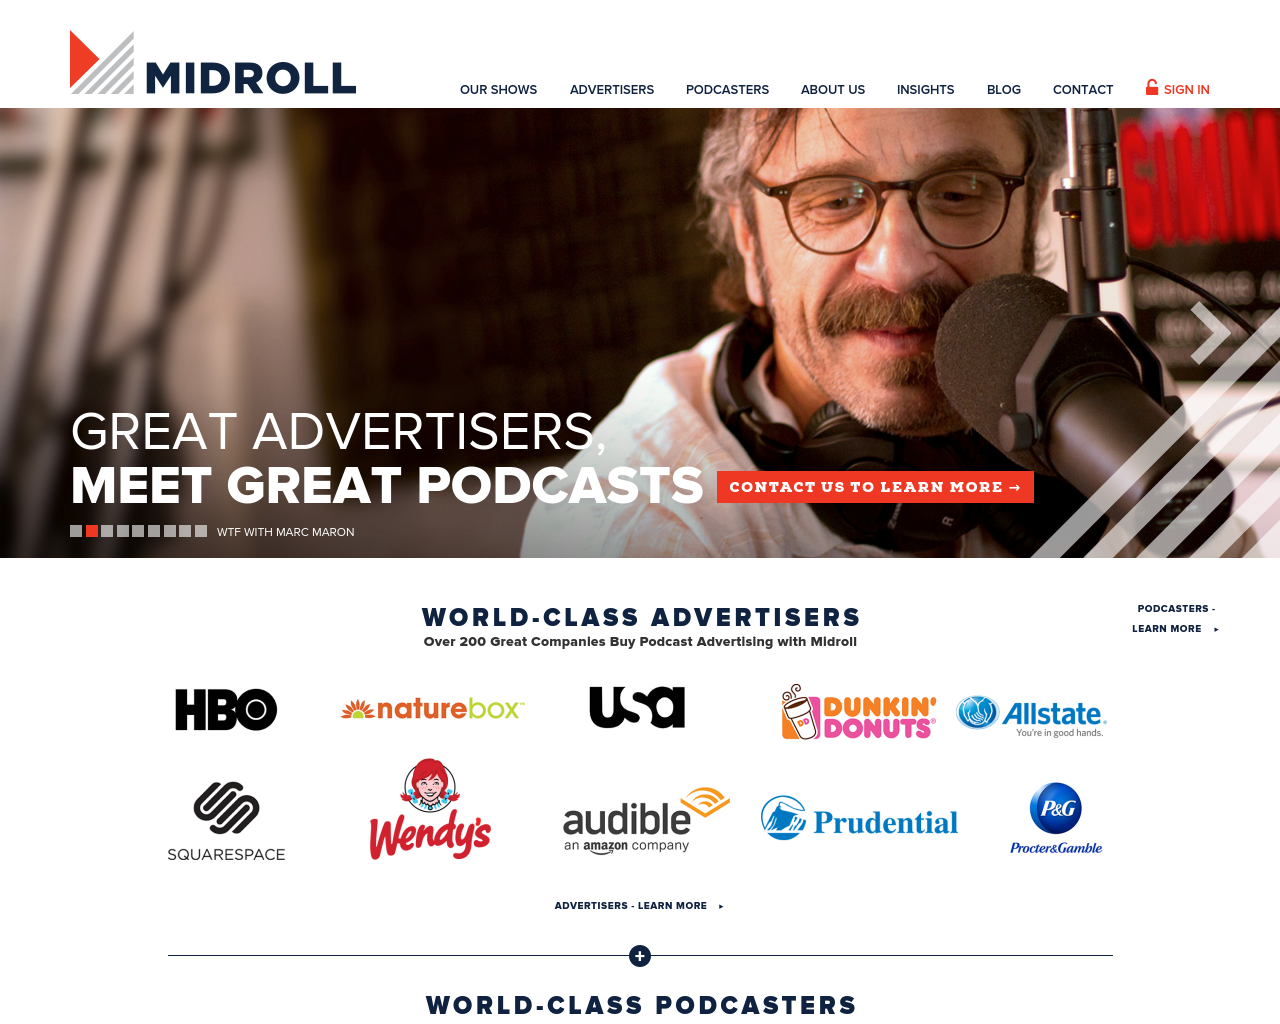 MidRoll-Advertising-Reviews-Pricing